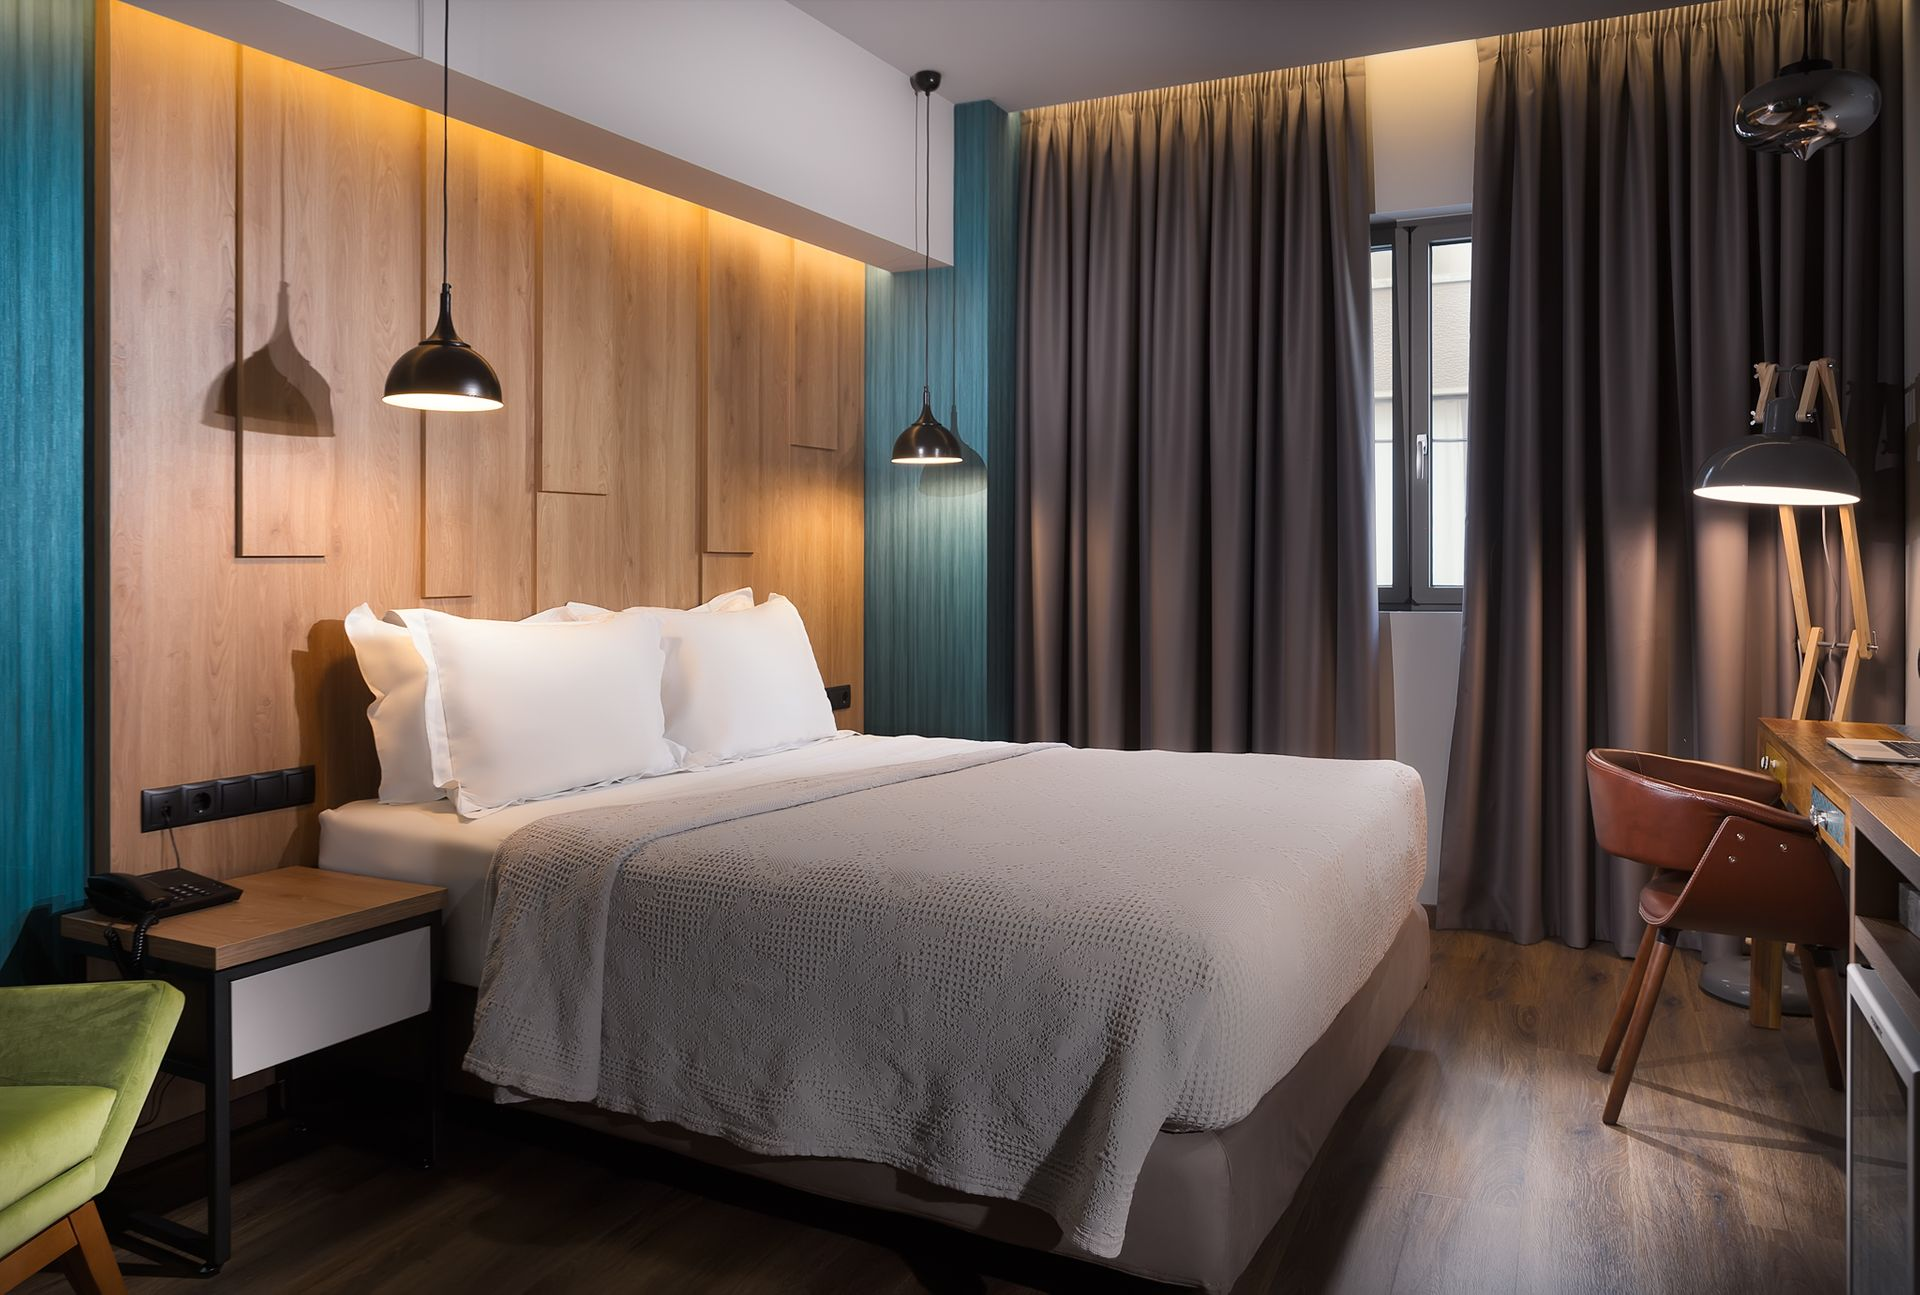 360 Degrees Pop Art Hotel - Αθήνα ✦ 2 Ημέρες (1 Διανυκτέρευση)